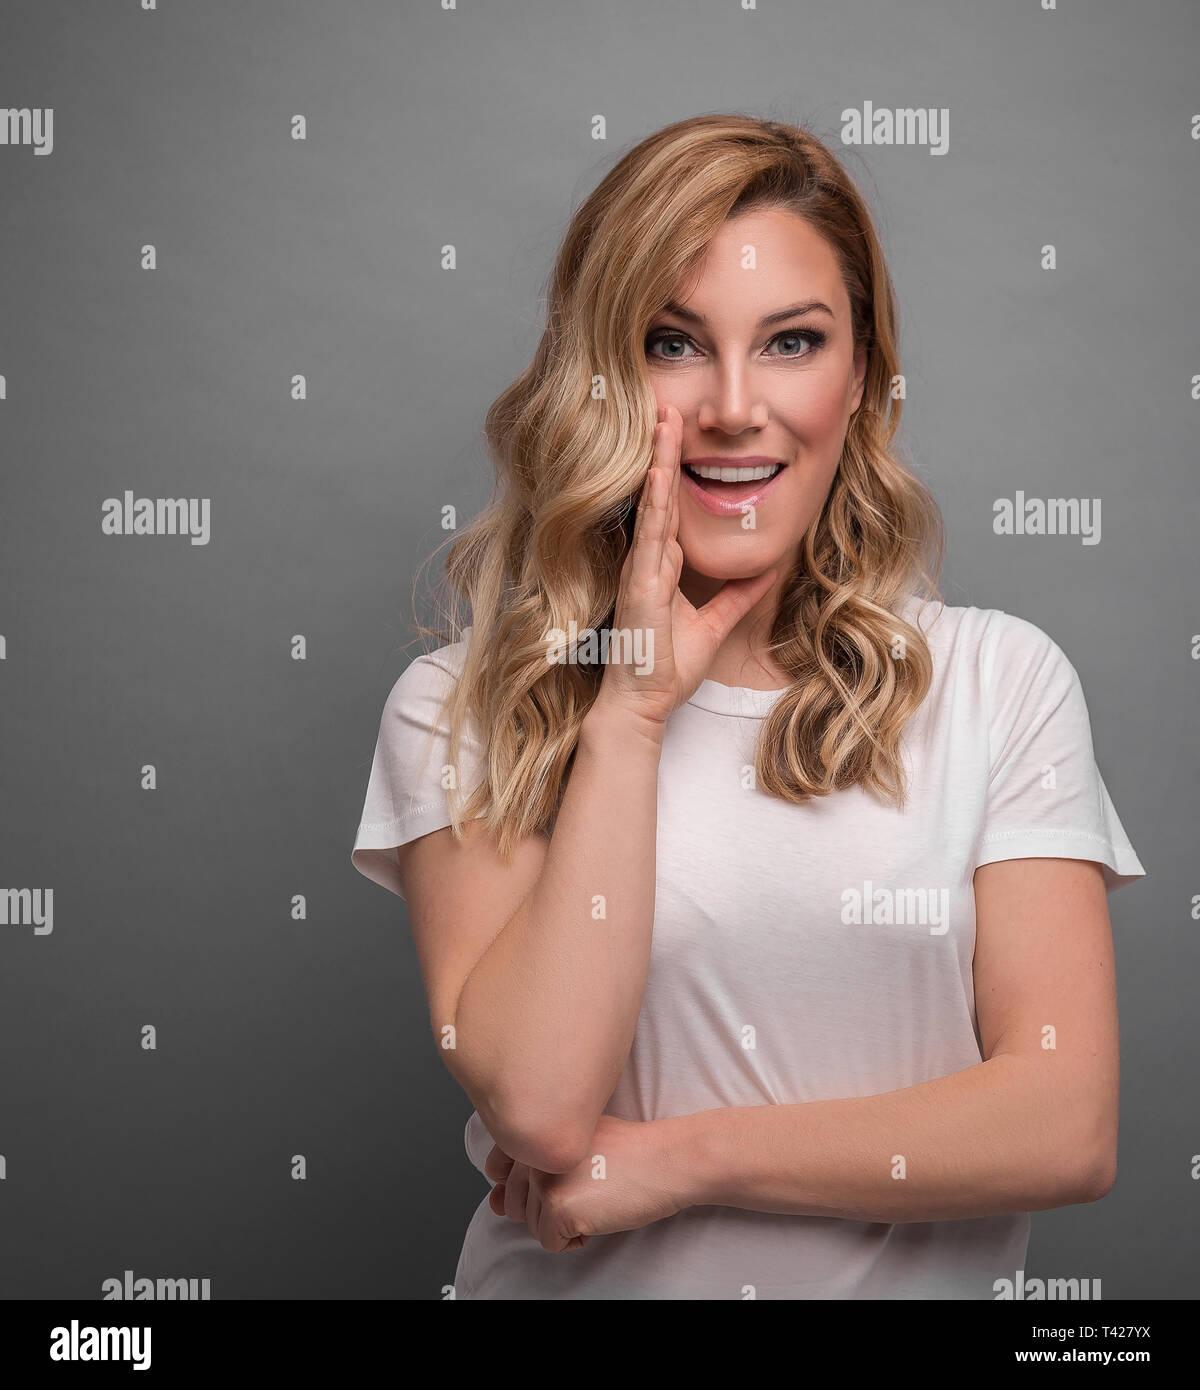 Beautiful blonde speaks about something secretly posing on gray background. - Stock Image